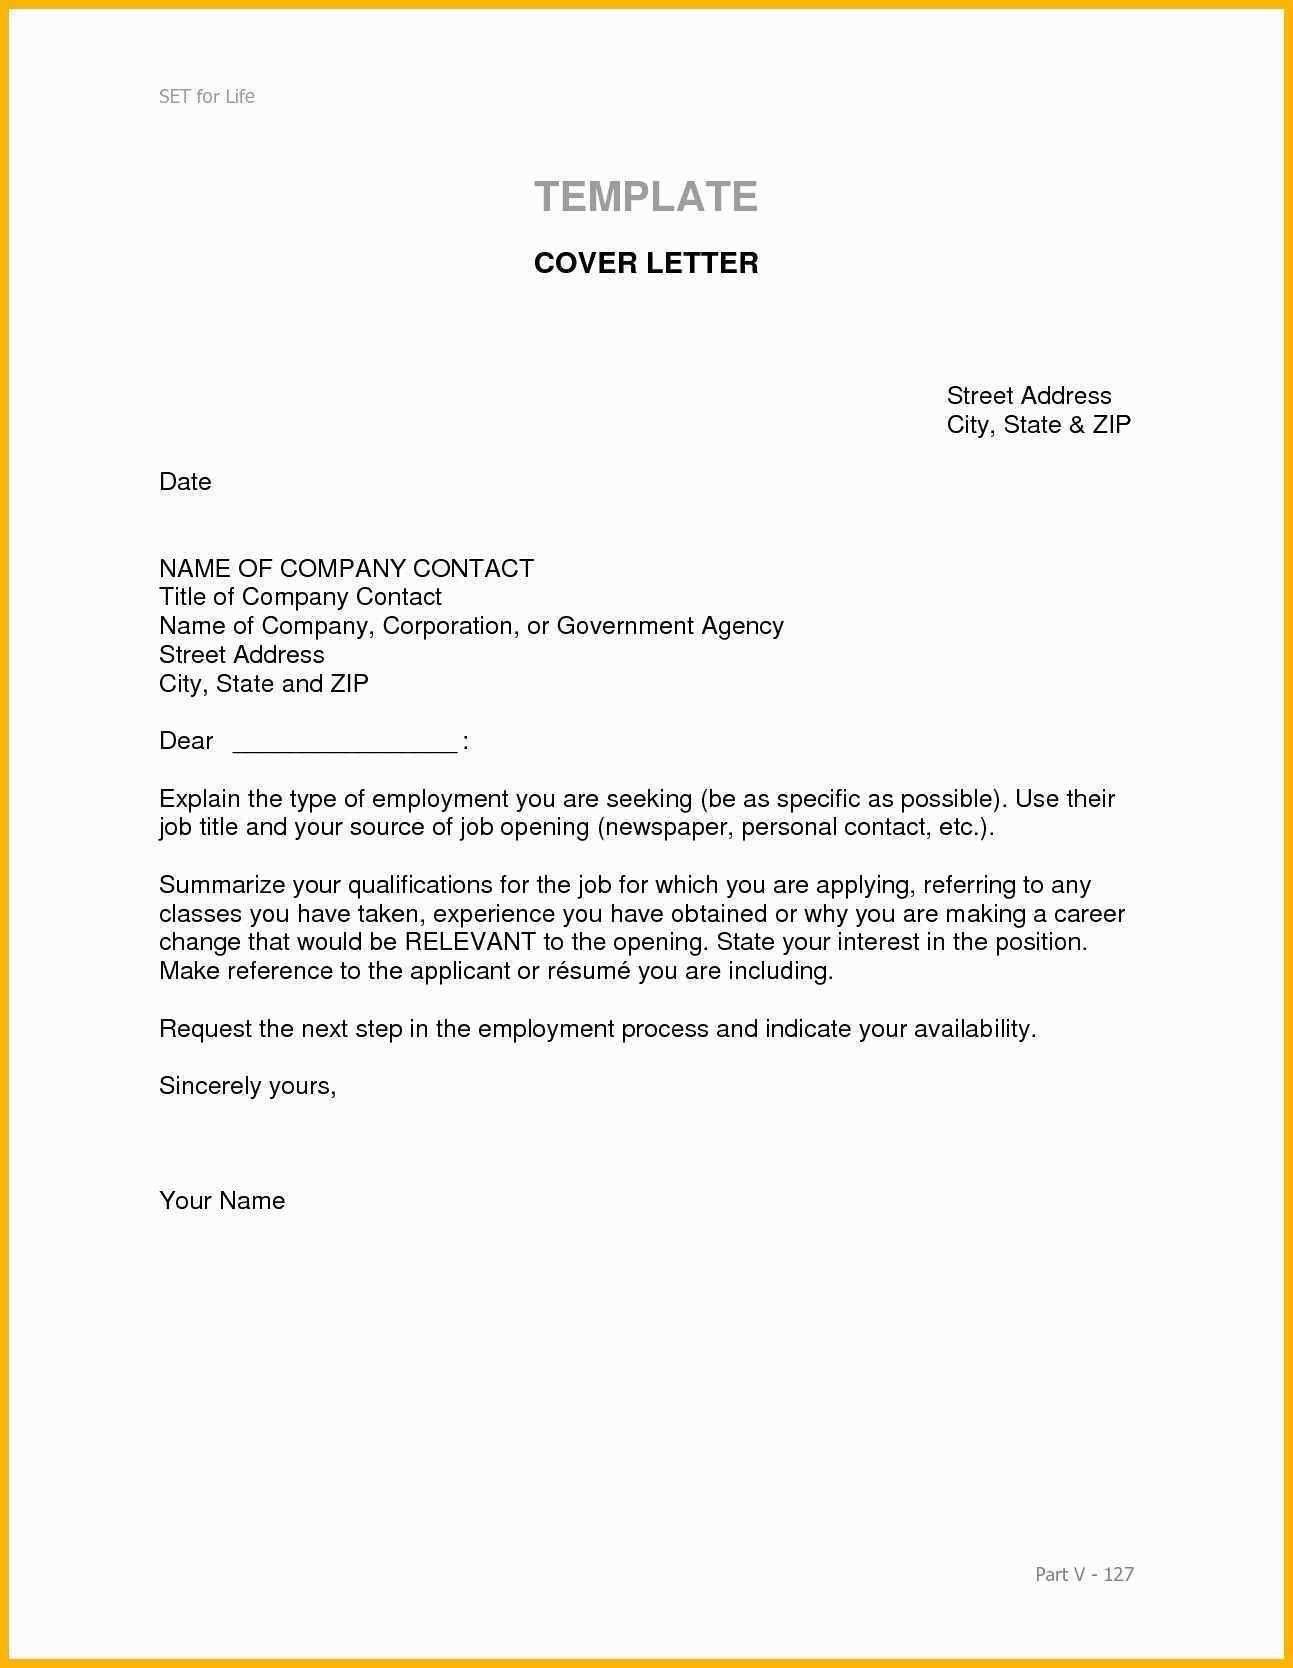 Career Change Cover Letter Cover Letter Format For Job Position